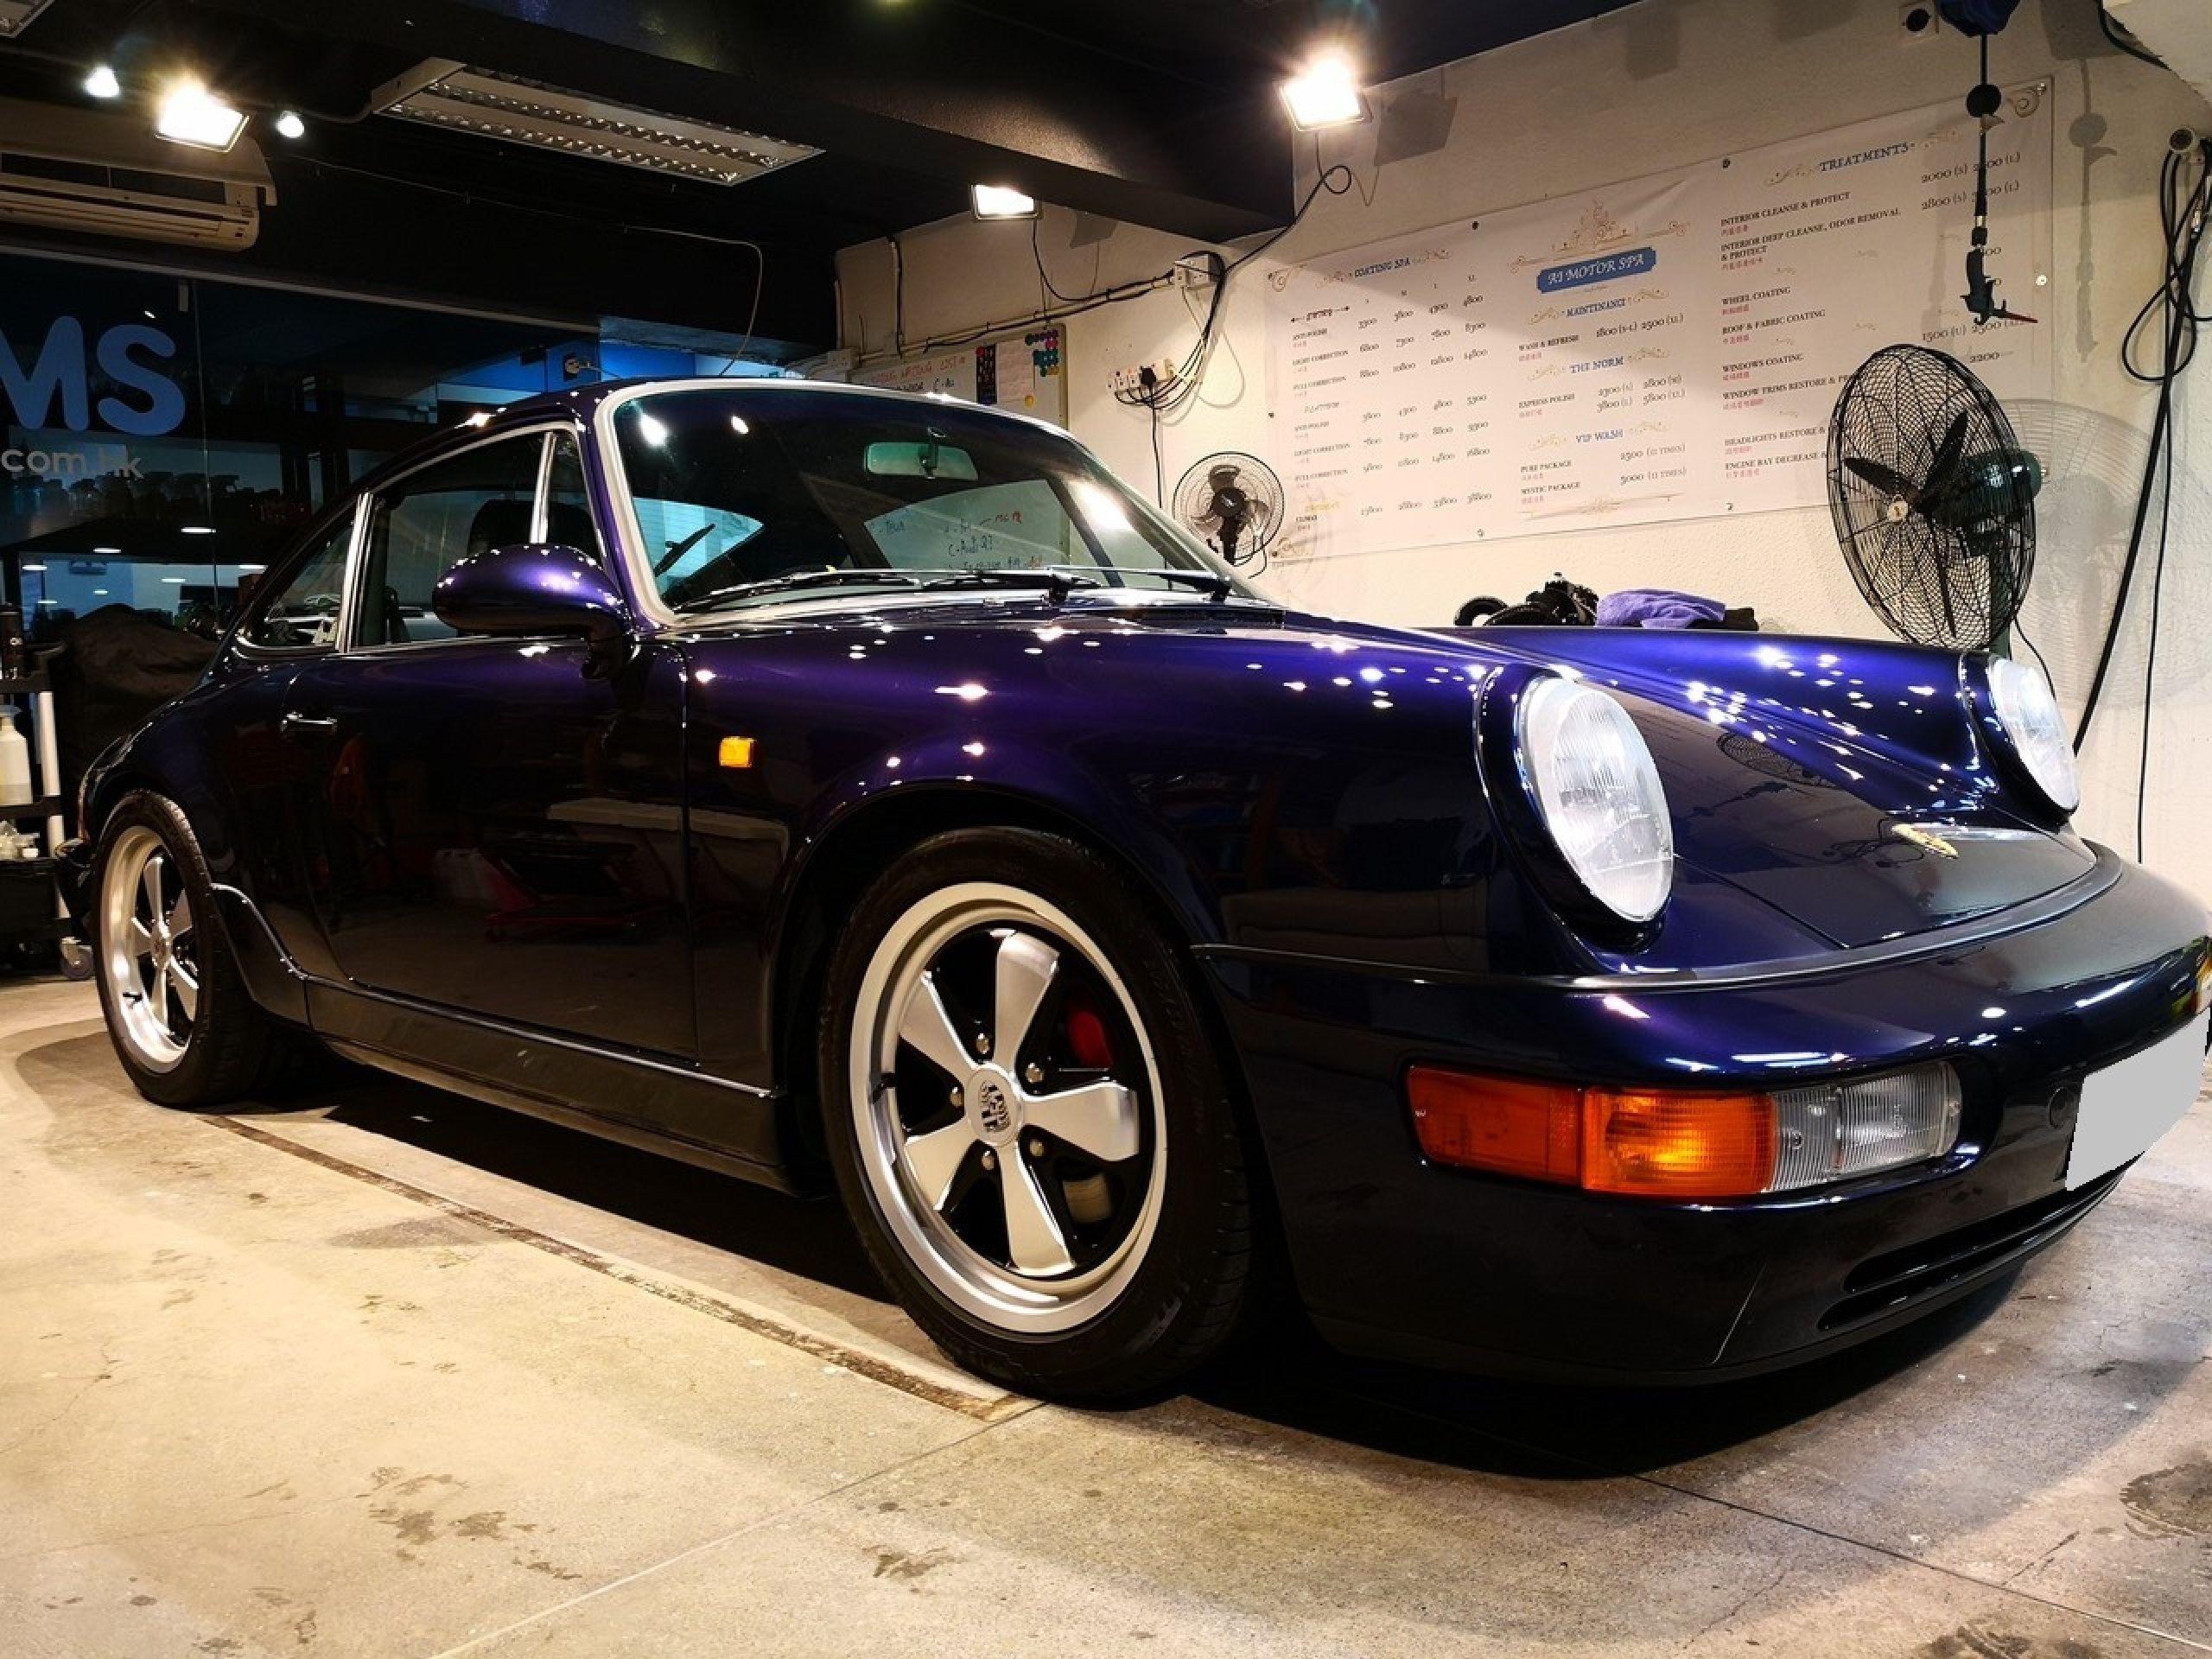 1992 Porsche 964 C2 Carrera Coupe